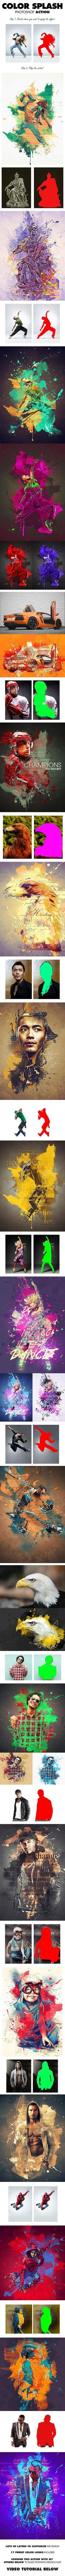 Typo and Watercolor Splash Photoshop Action